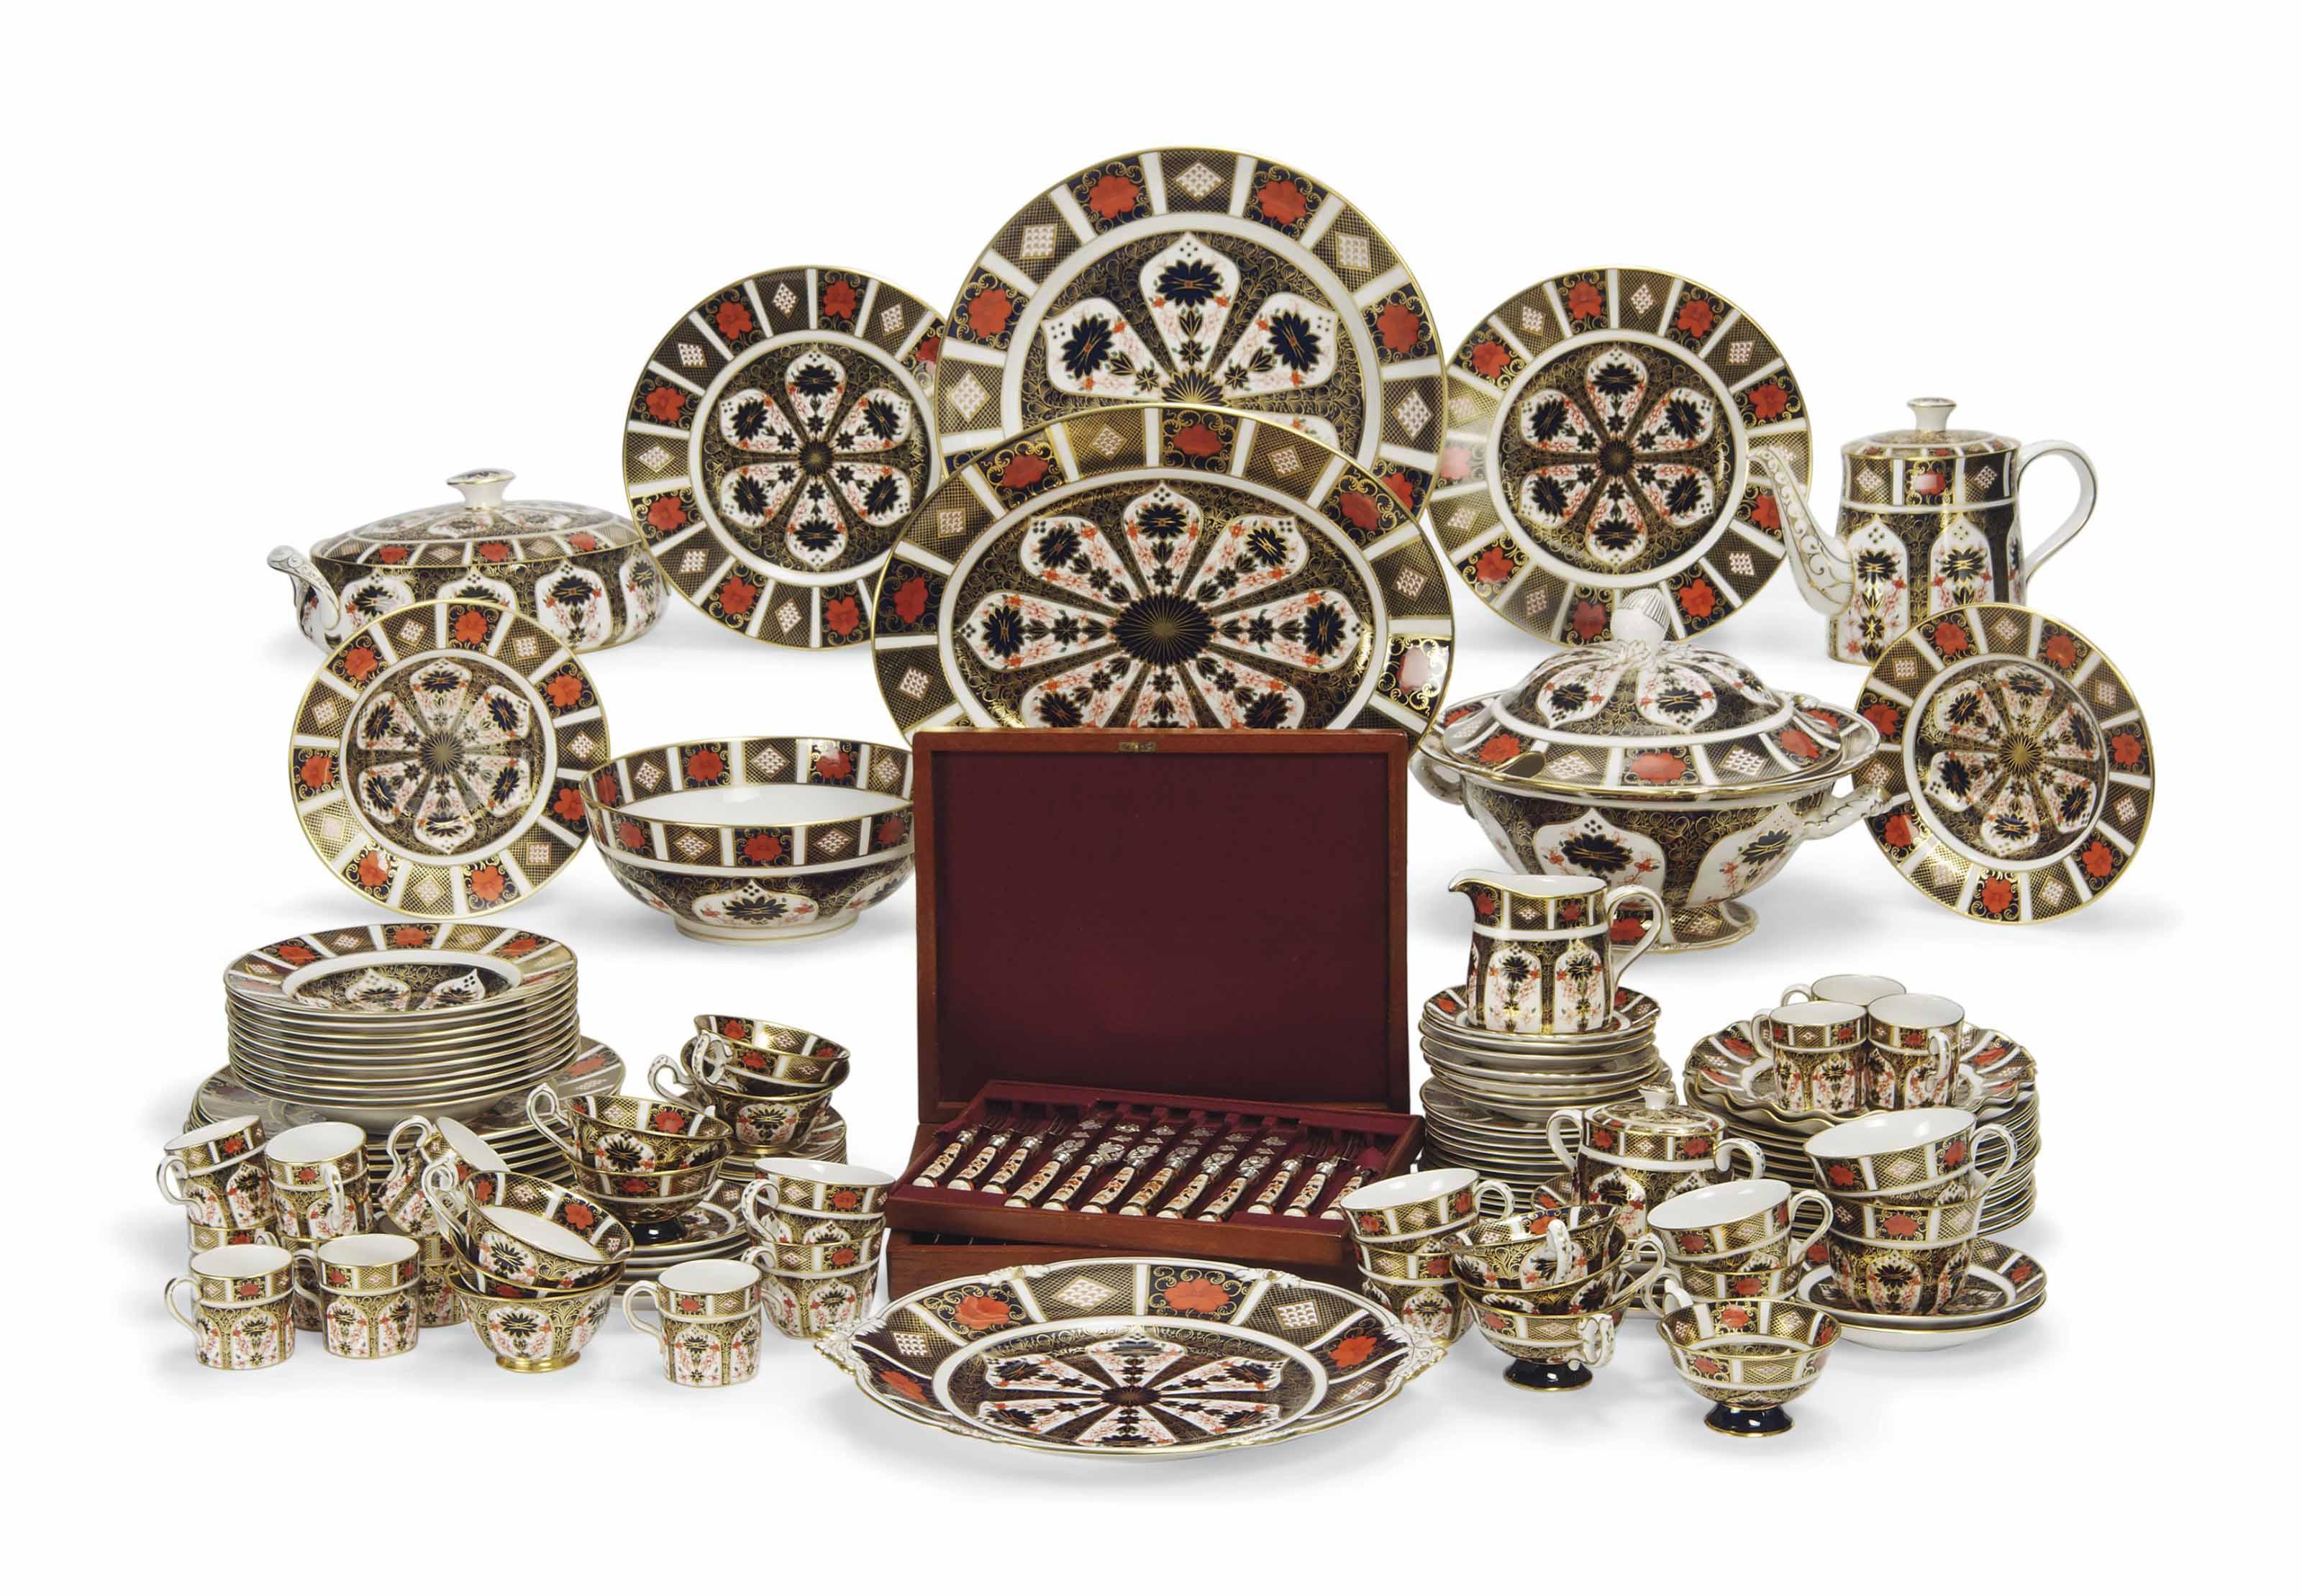 AN EXTENSIVE ROYAL CROWN DERBY IMARI PATTERN TABLE-SERVICE